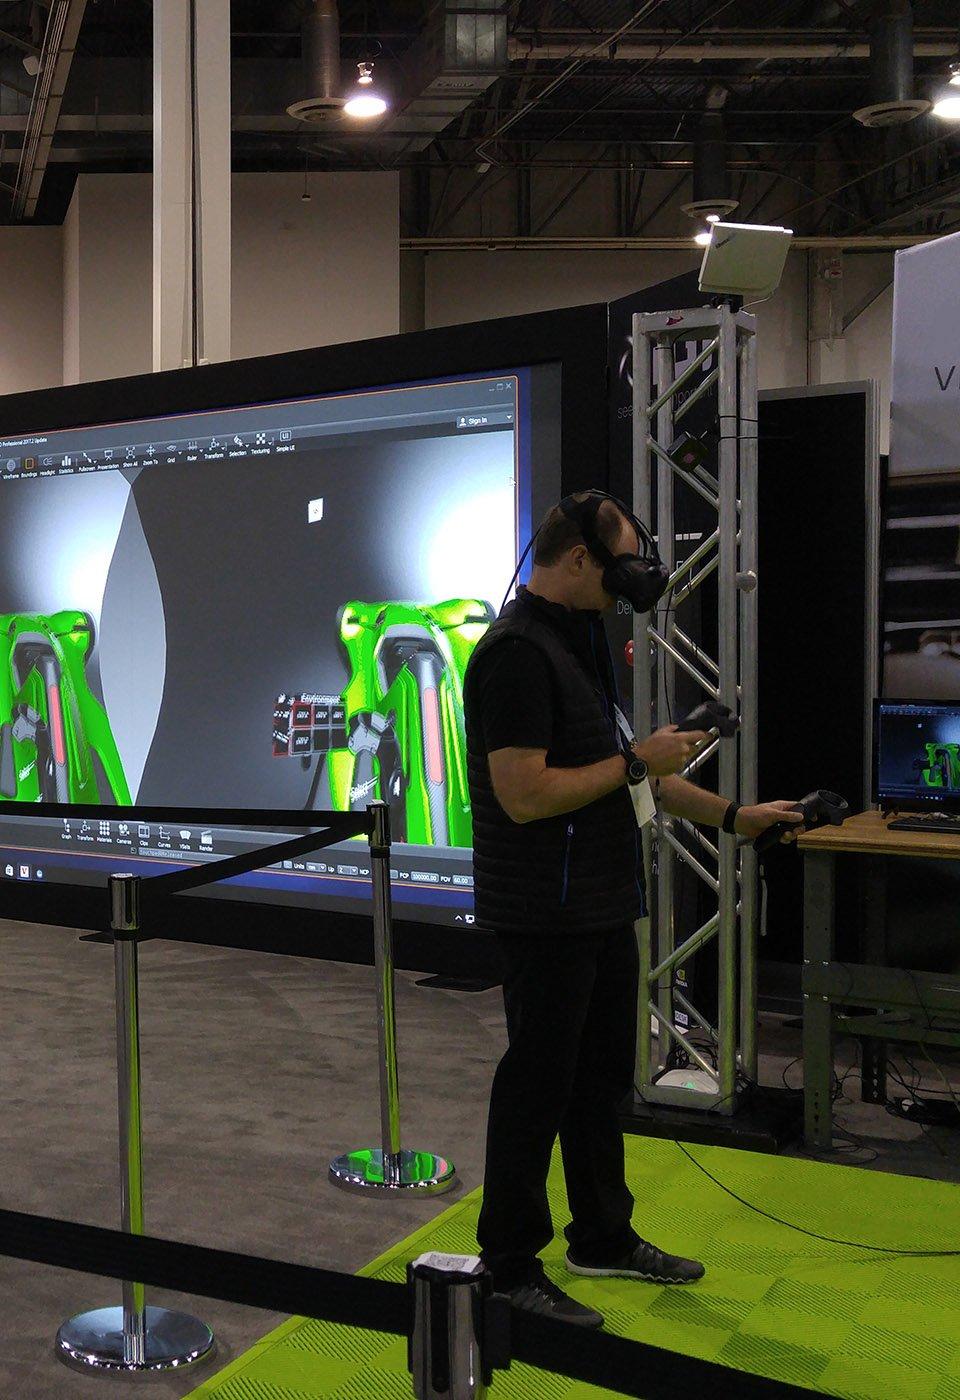 IGI demo of head mounted display VR at Autodesk University